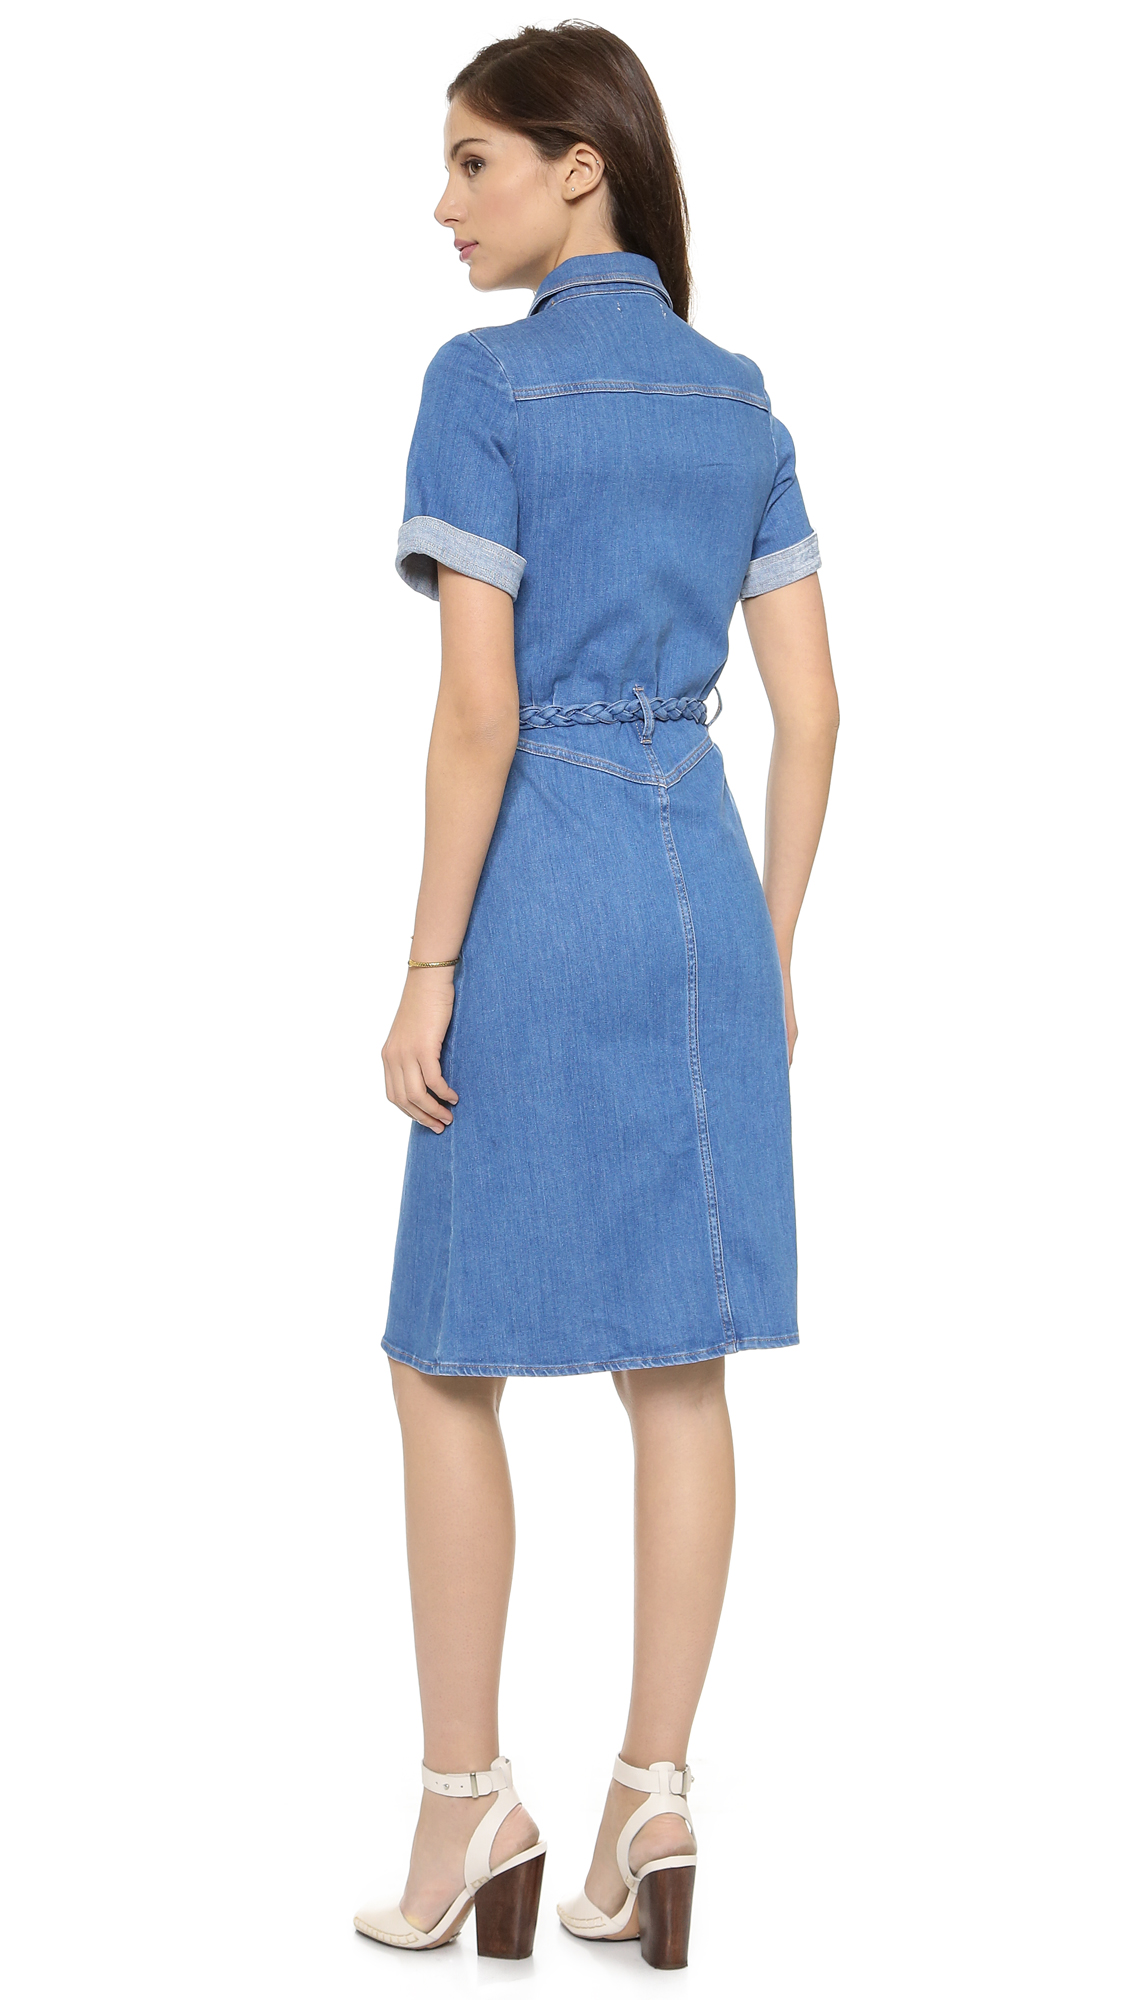 ad3ddd9066e M.i.h Jeans The  70s Denim Dress